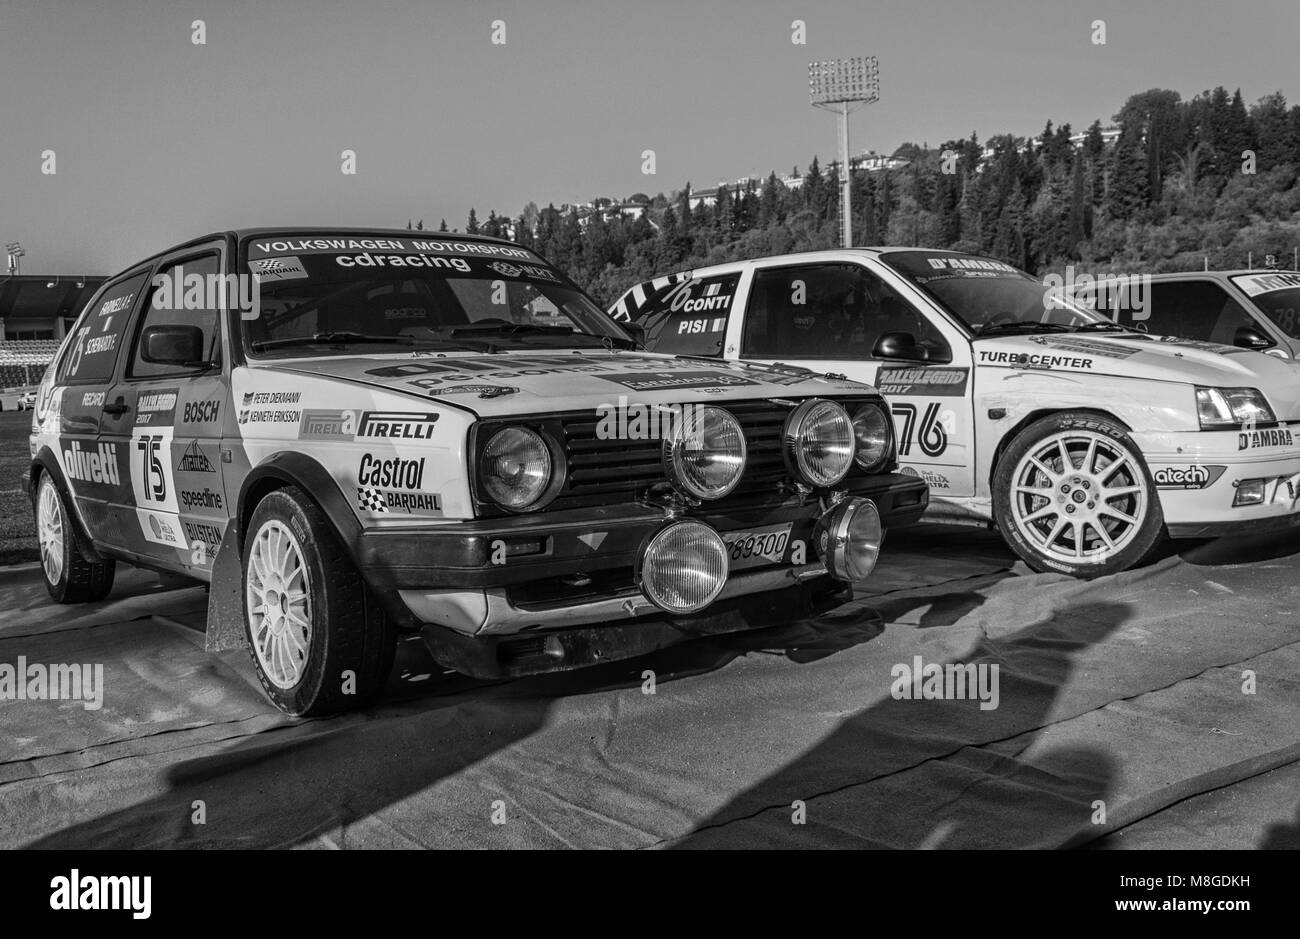 SANMARINO, SANMARINO - OTT 21, 2017 : VOLKSWAGEN GOLF GTI 16V 1987 in old racing car rally THE LEGEND 2017 the famous - Stock Image